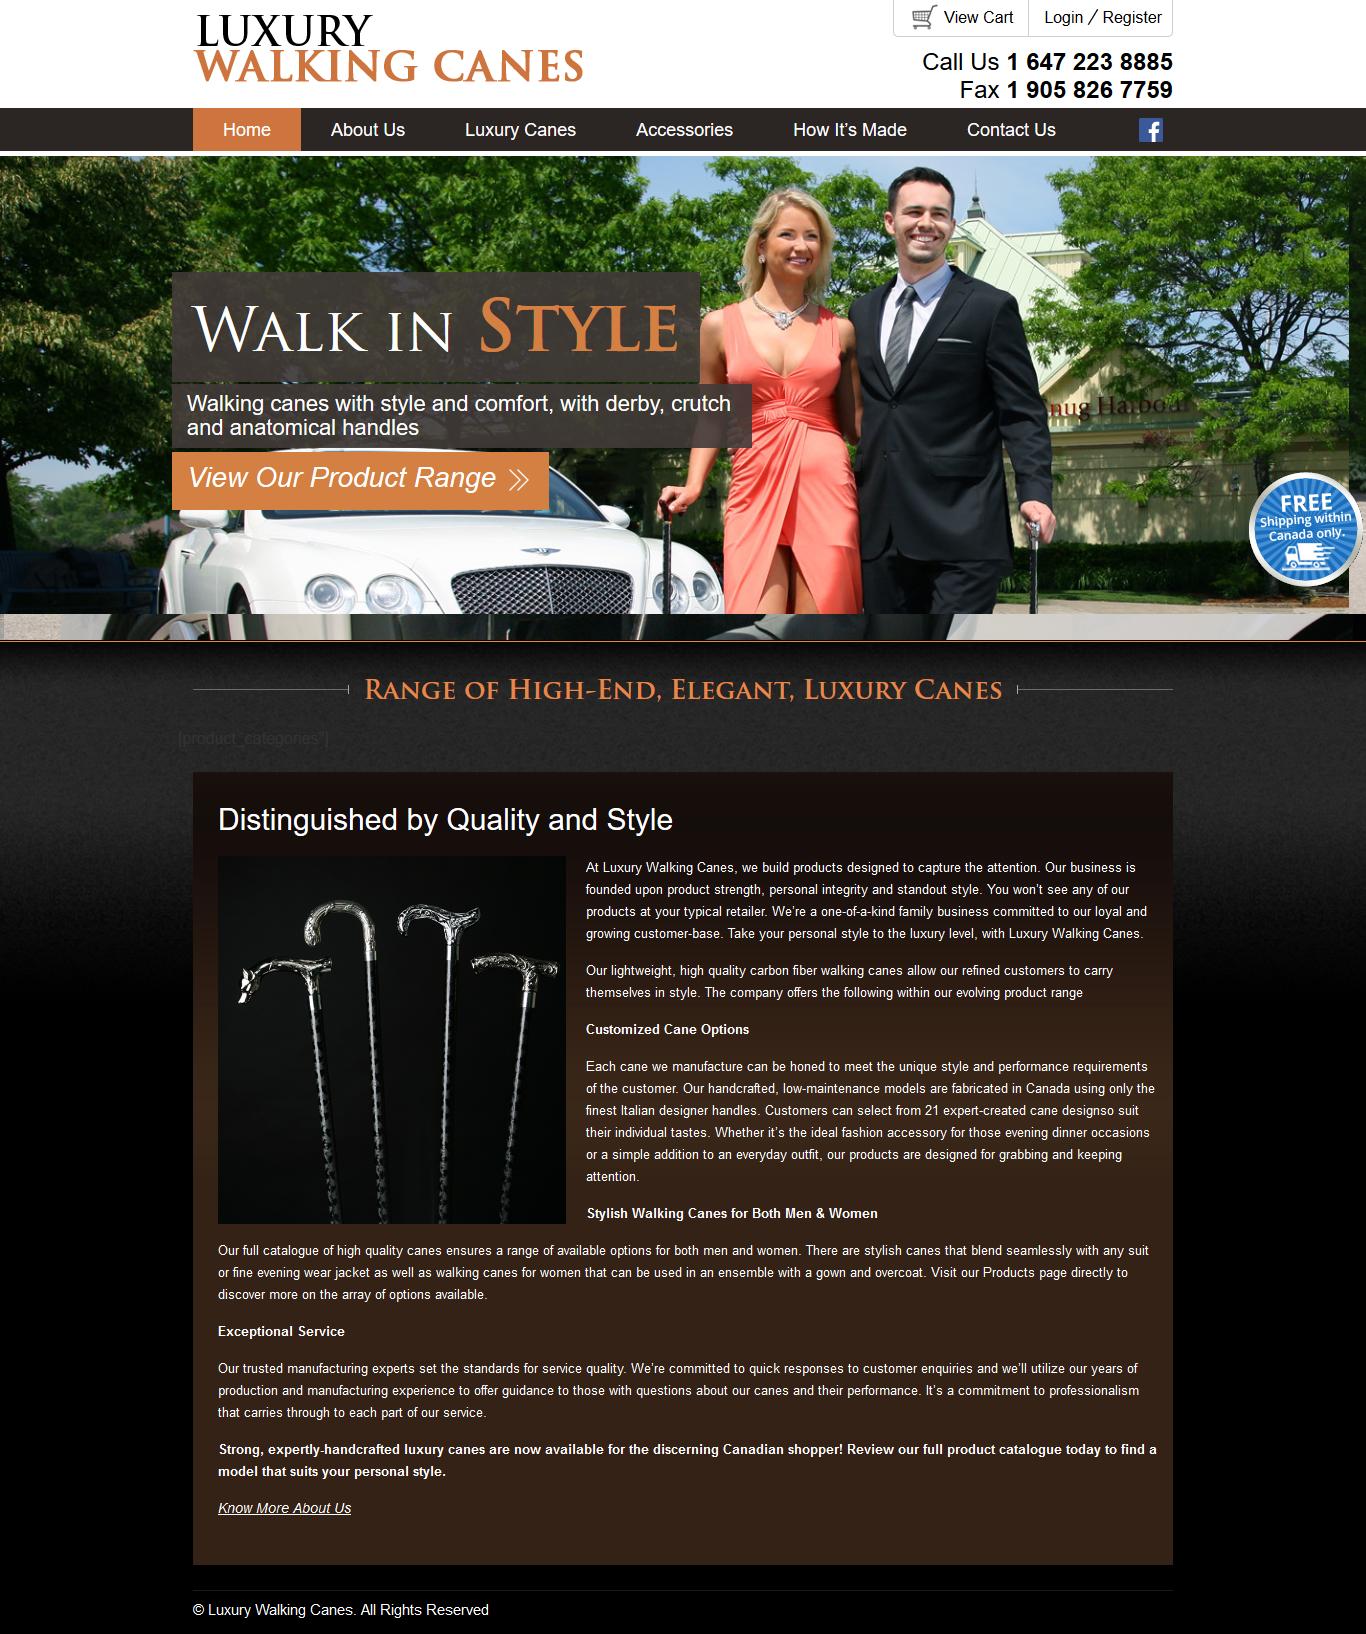 Luxury walking canes